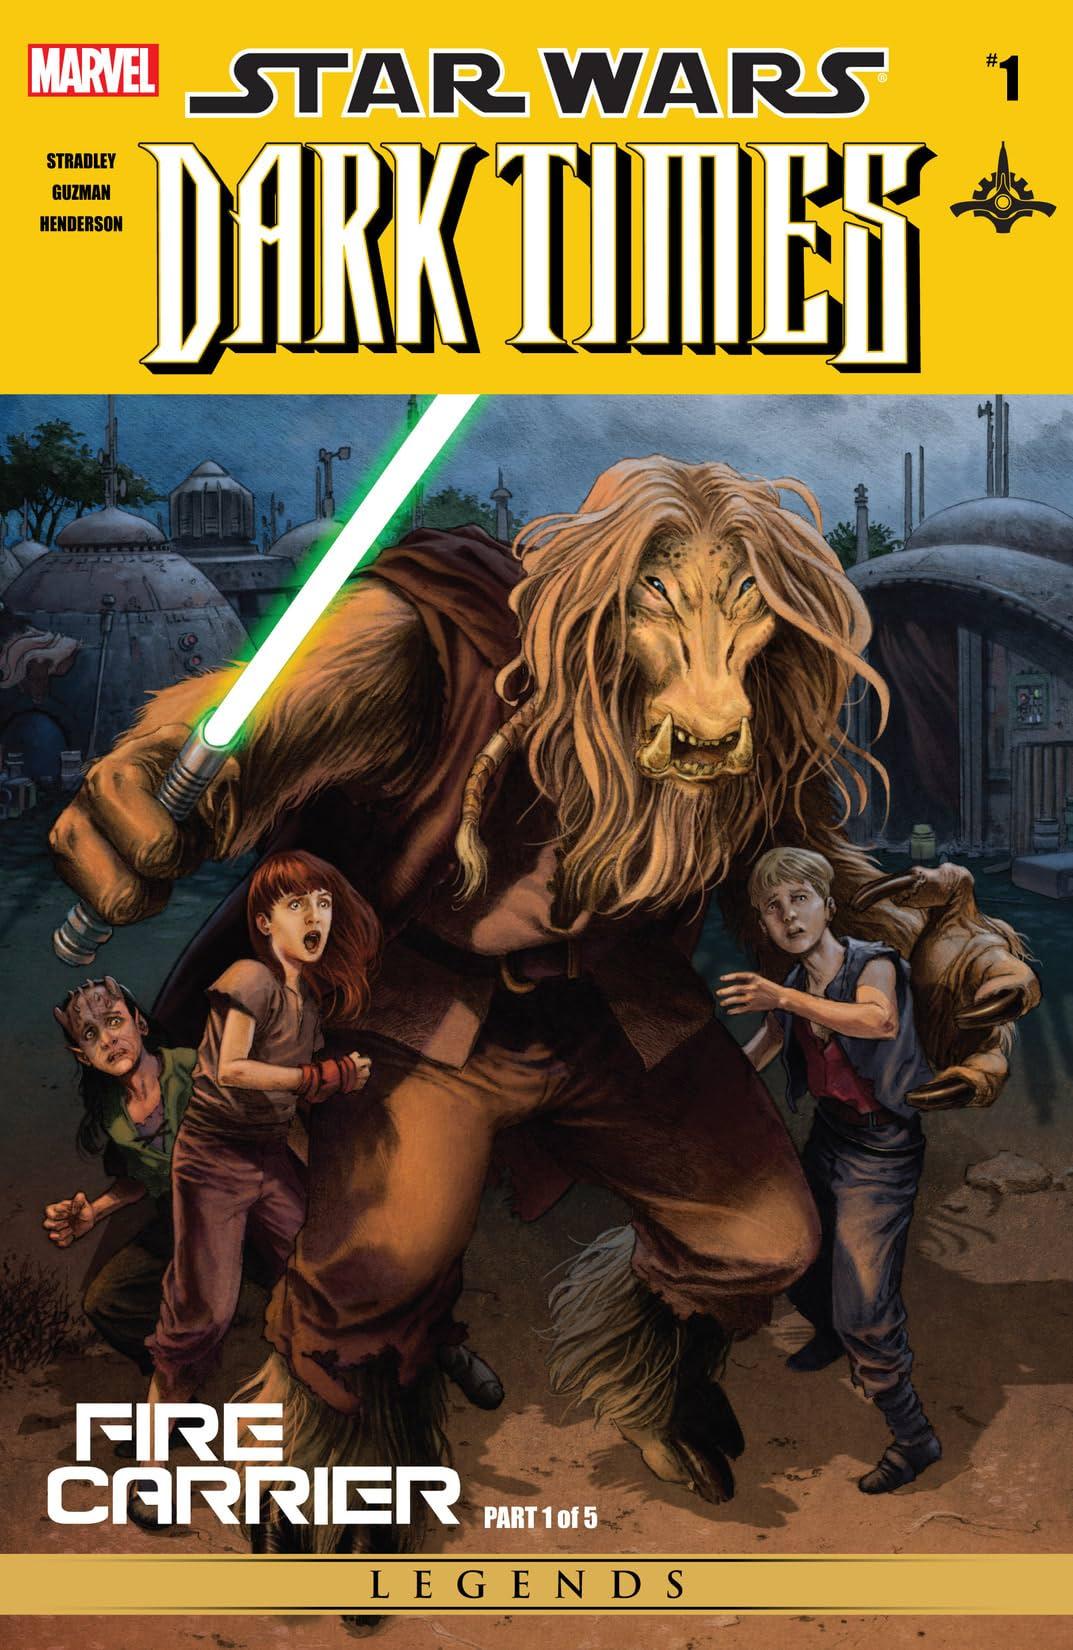 Star Wars: Dark Times - Fire Carrier (2013) #1 (of 5)